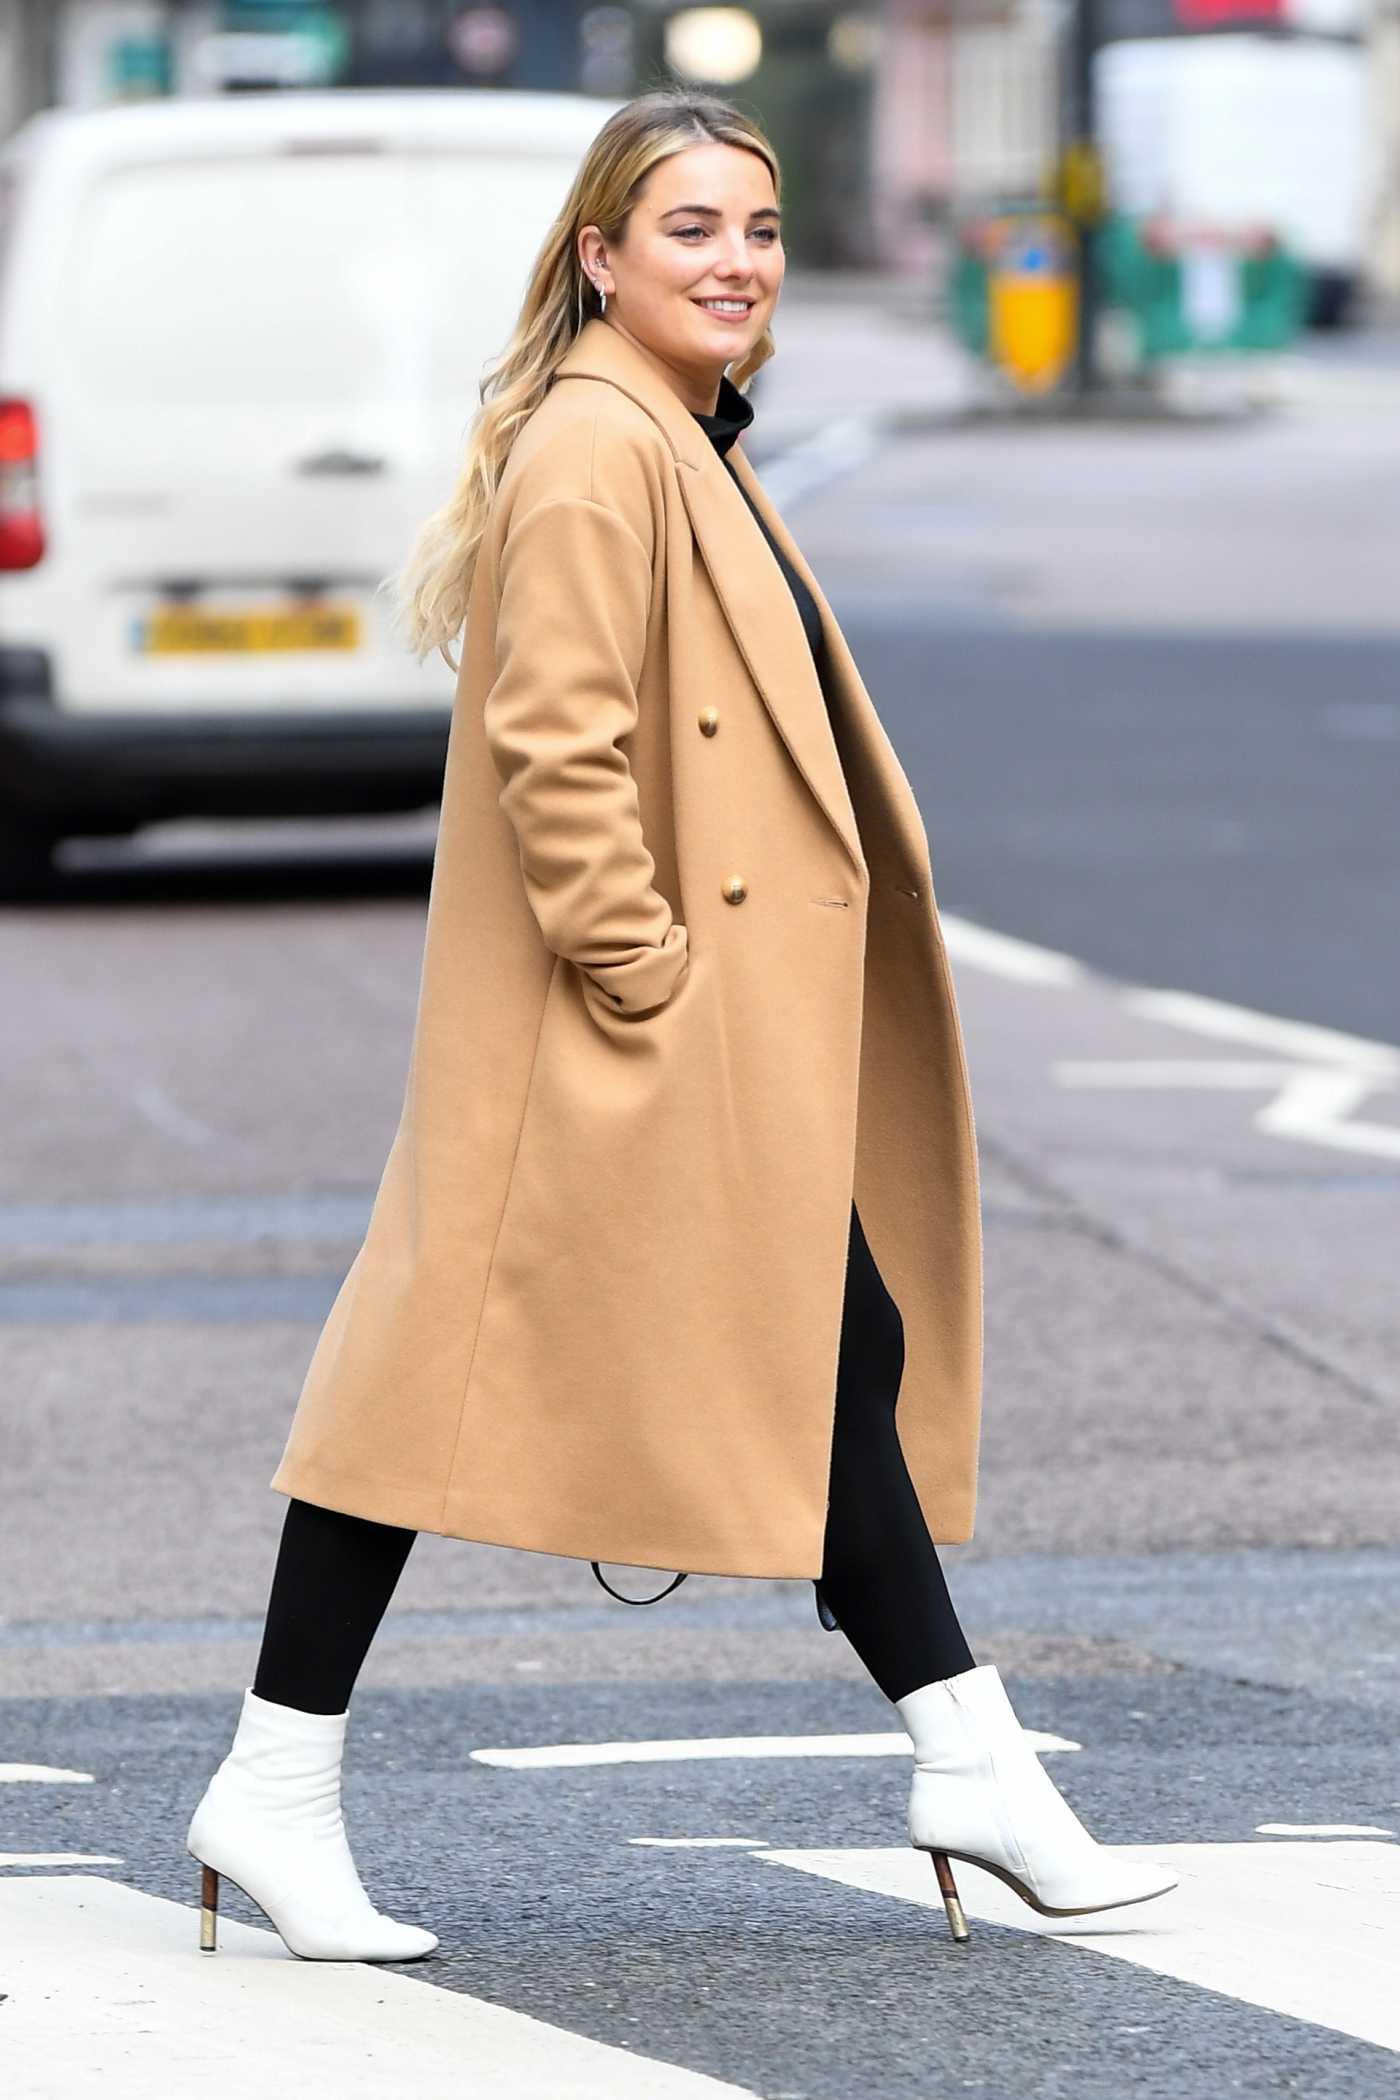 Sian Welby in a Beige Coat Leaves the Global Studios in London 01/15/2021